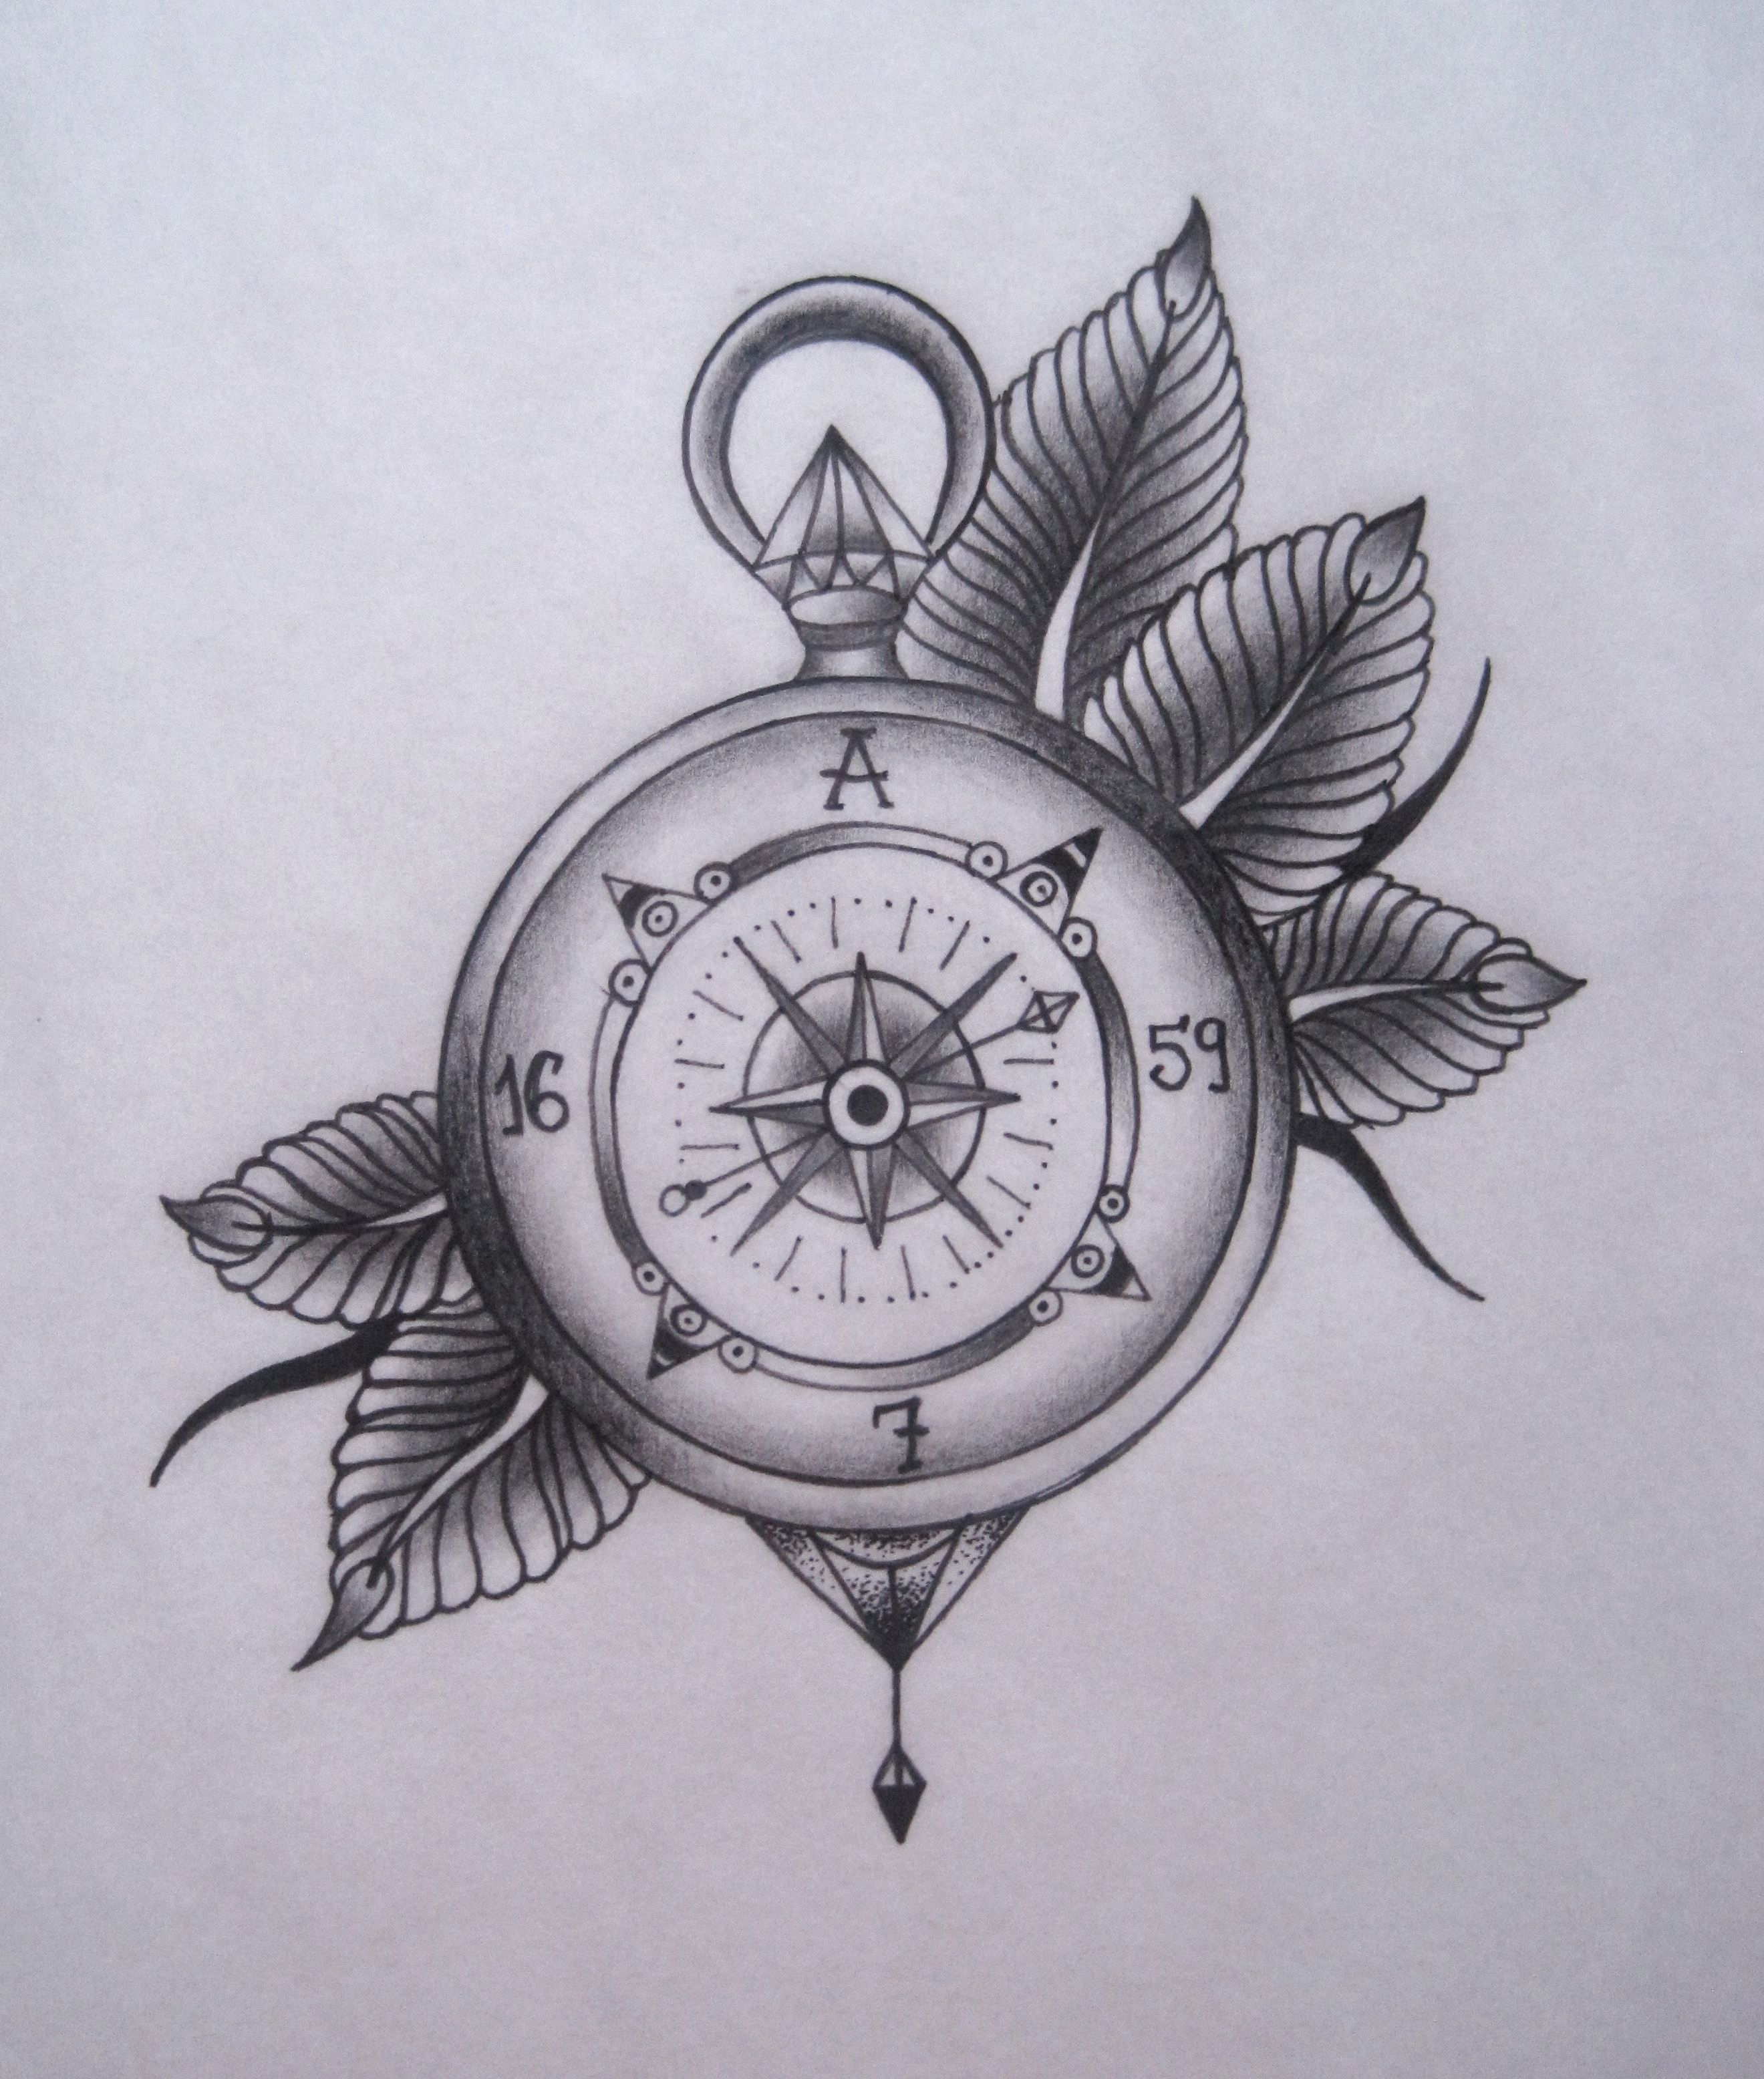 Compass Tattoo | Tattoo\'s | Tattoo zeichnungen, Kompass, Tätowierungen